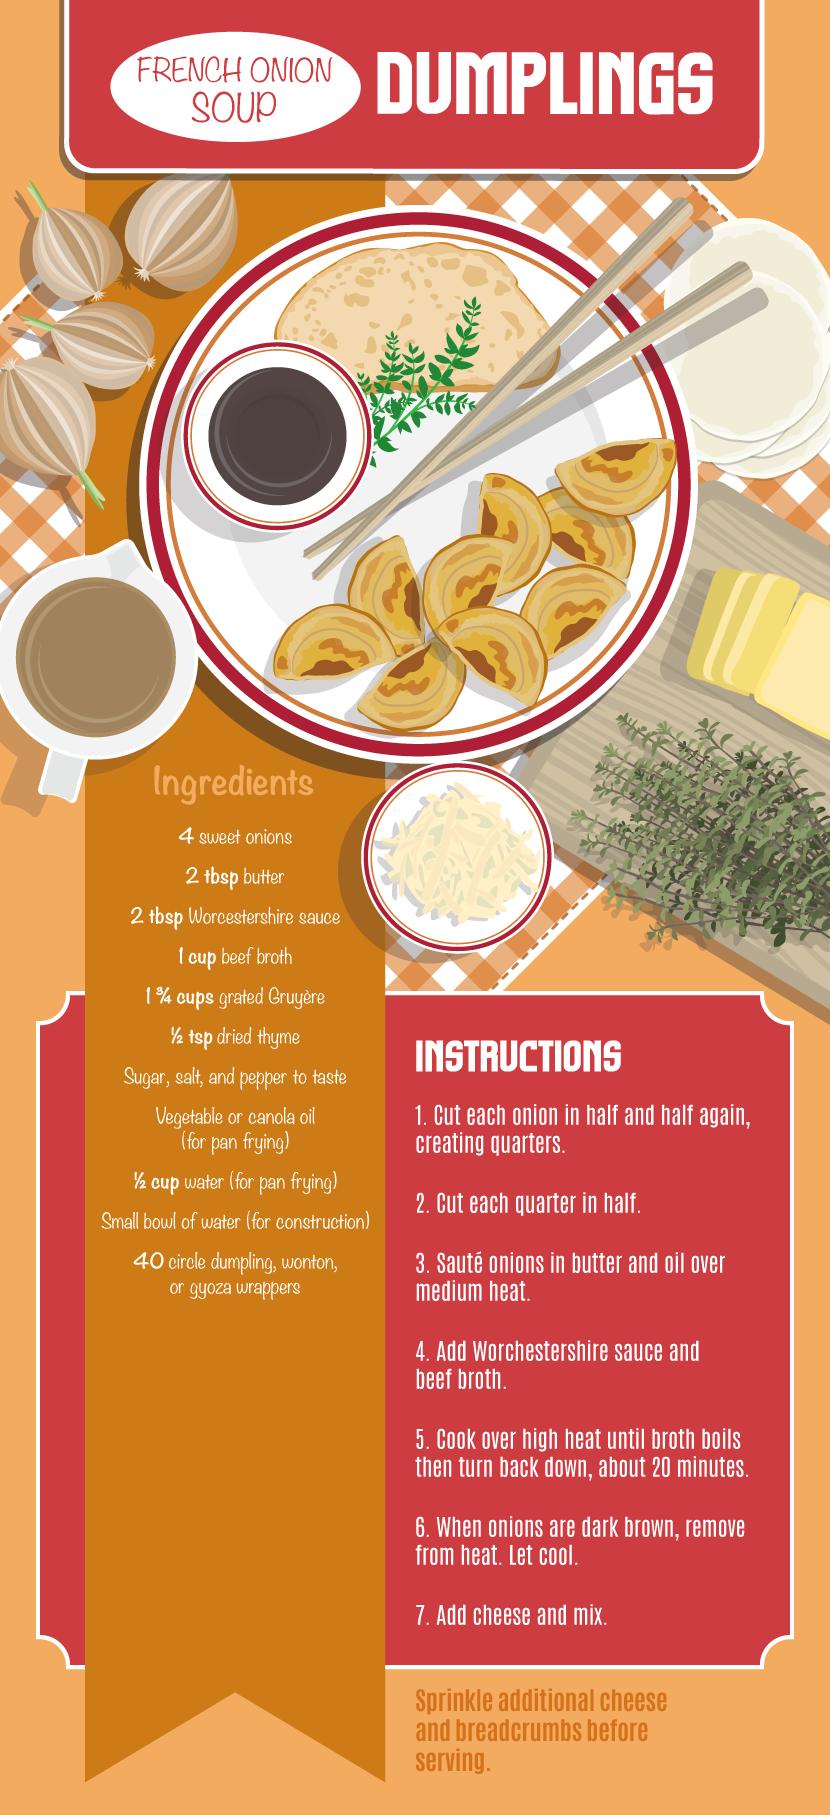 French Onion Soup Dumplings - Making Your Own Dumplings